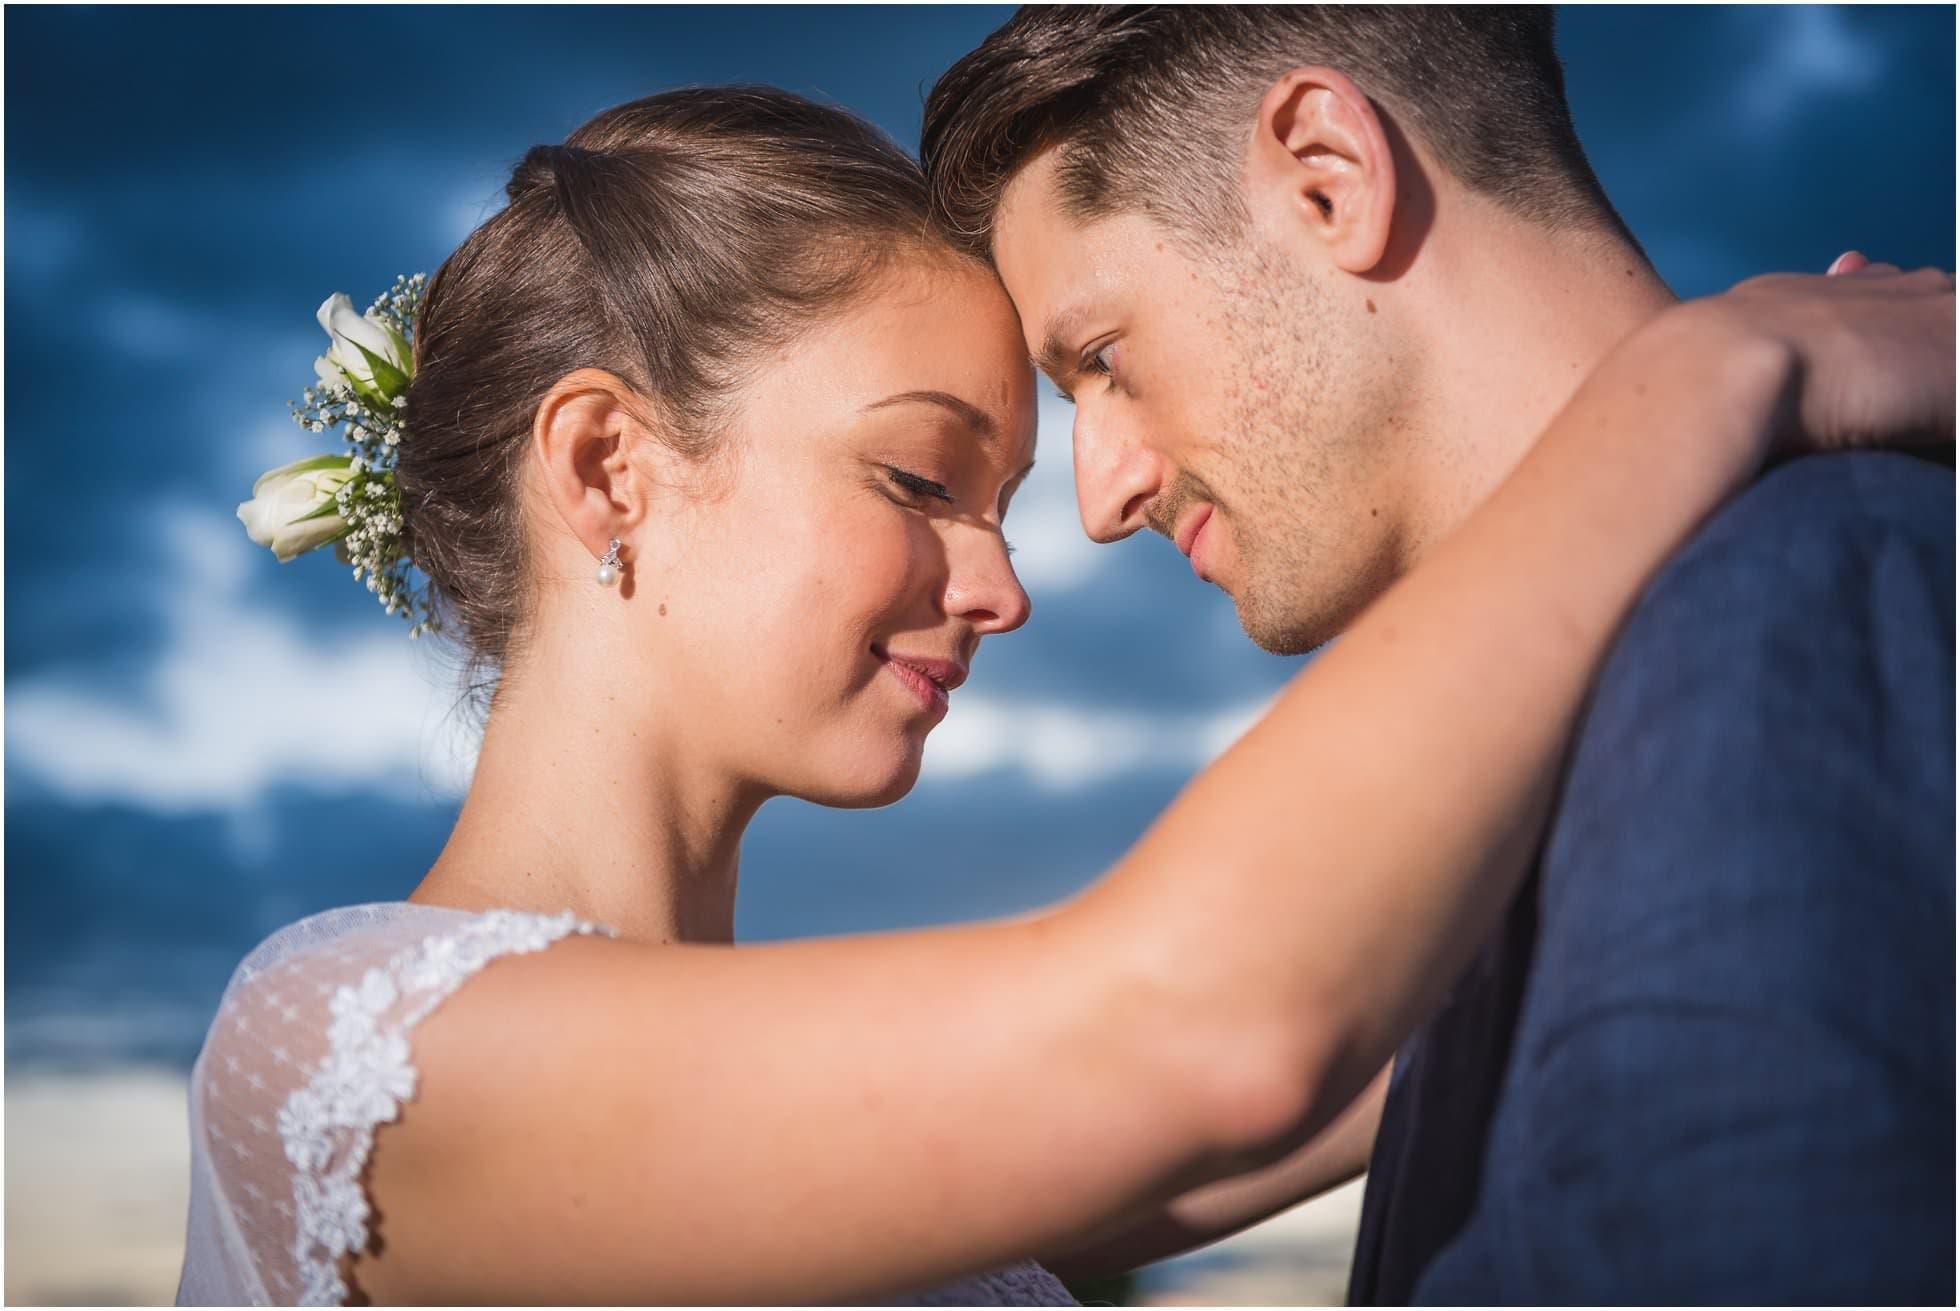 East Anglia Wedding Photographer Winston Sanders shot of this stunning bride and groom